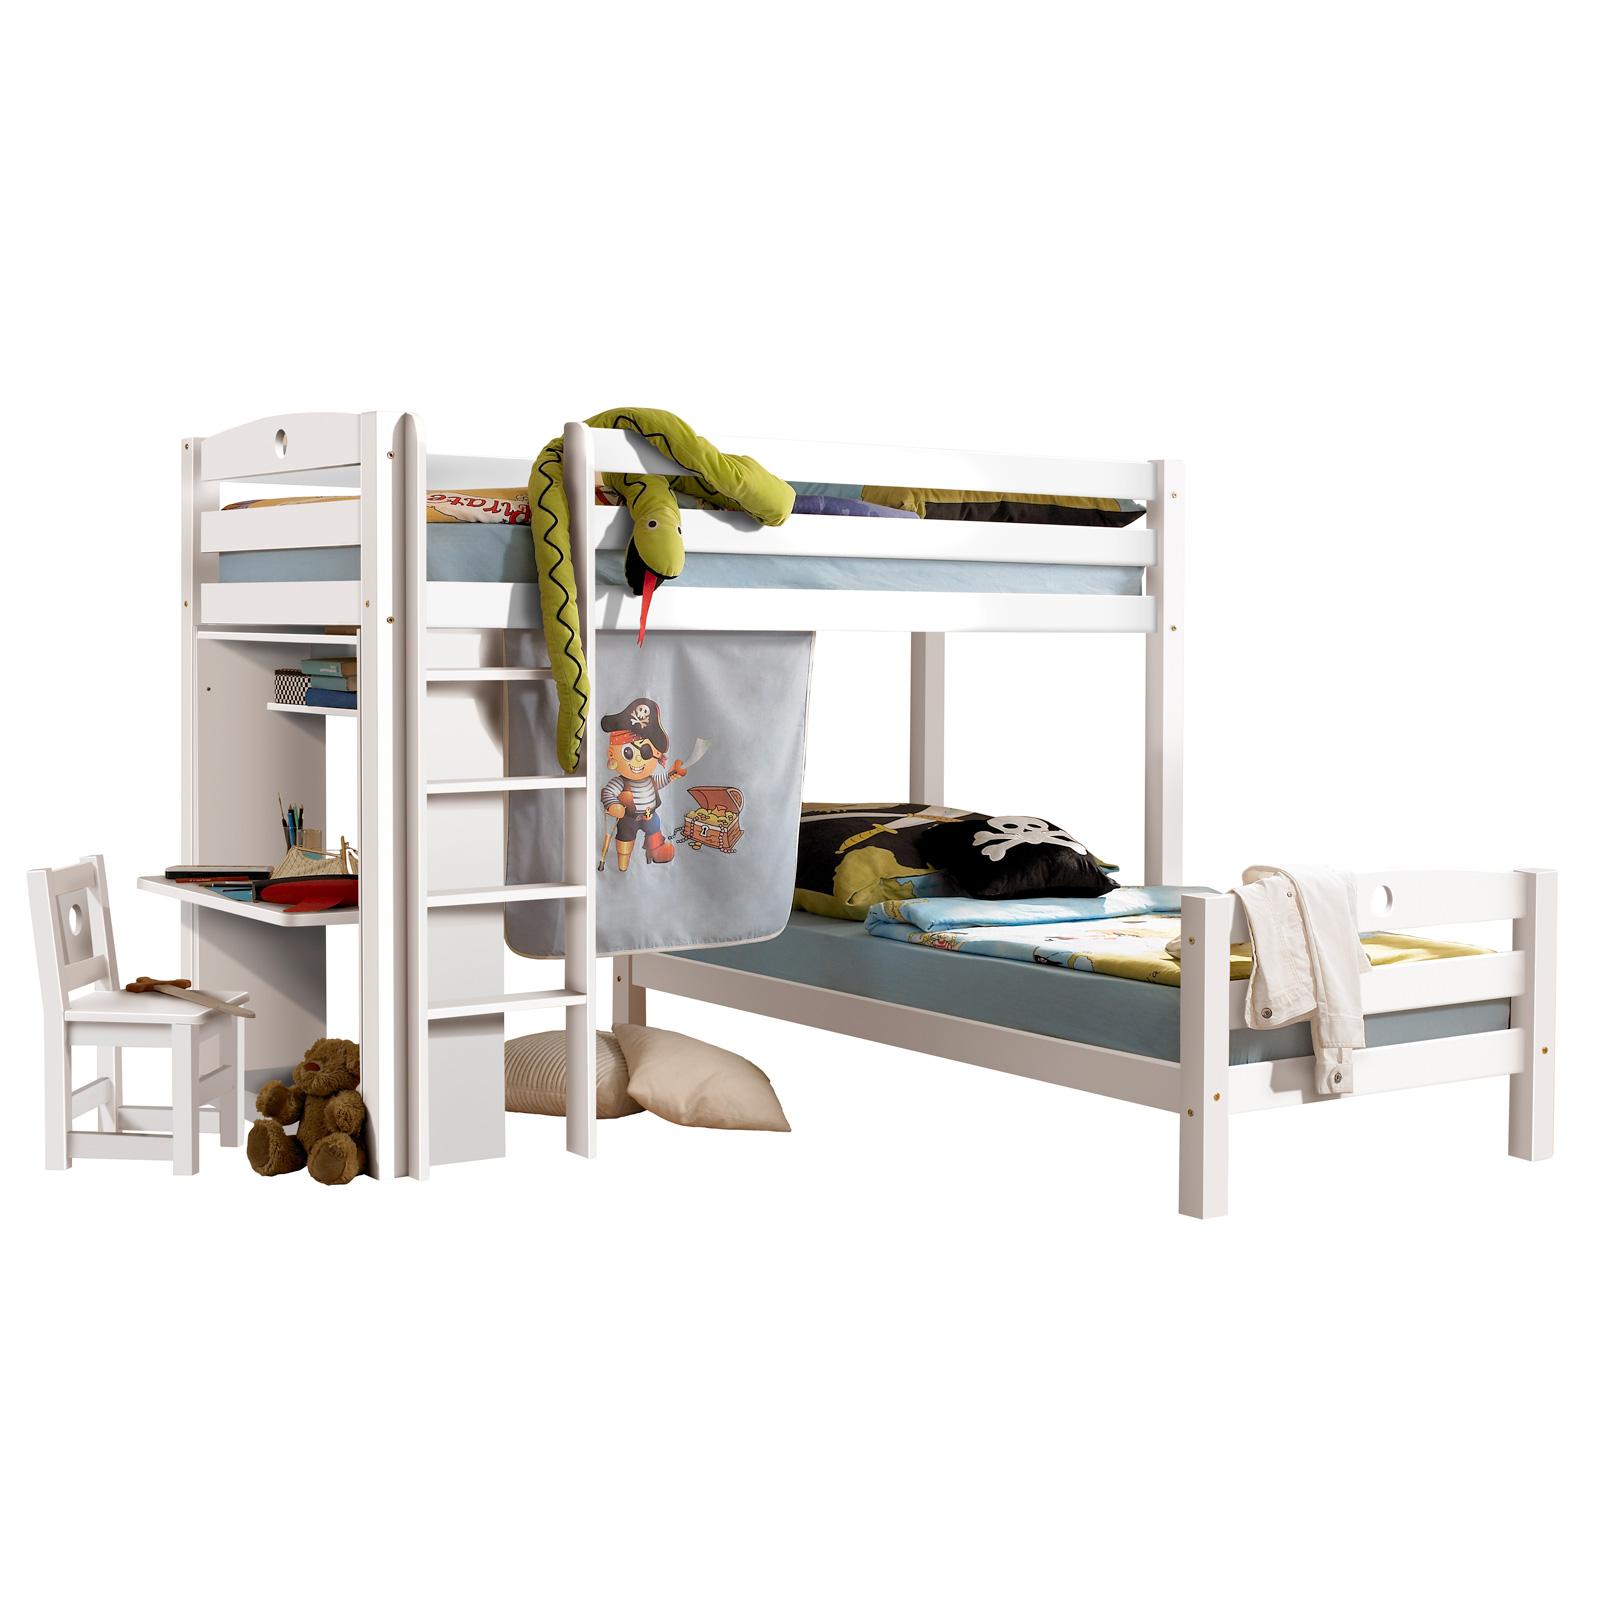 etagenbett hochbett lars larry kinderzimmer in kiefer massiv weiss ebay. Black Bedroom Furniture Sets. Home Design Ideas